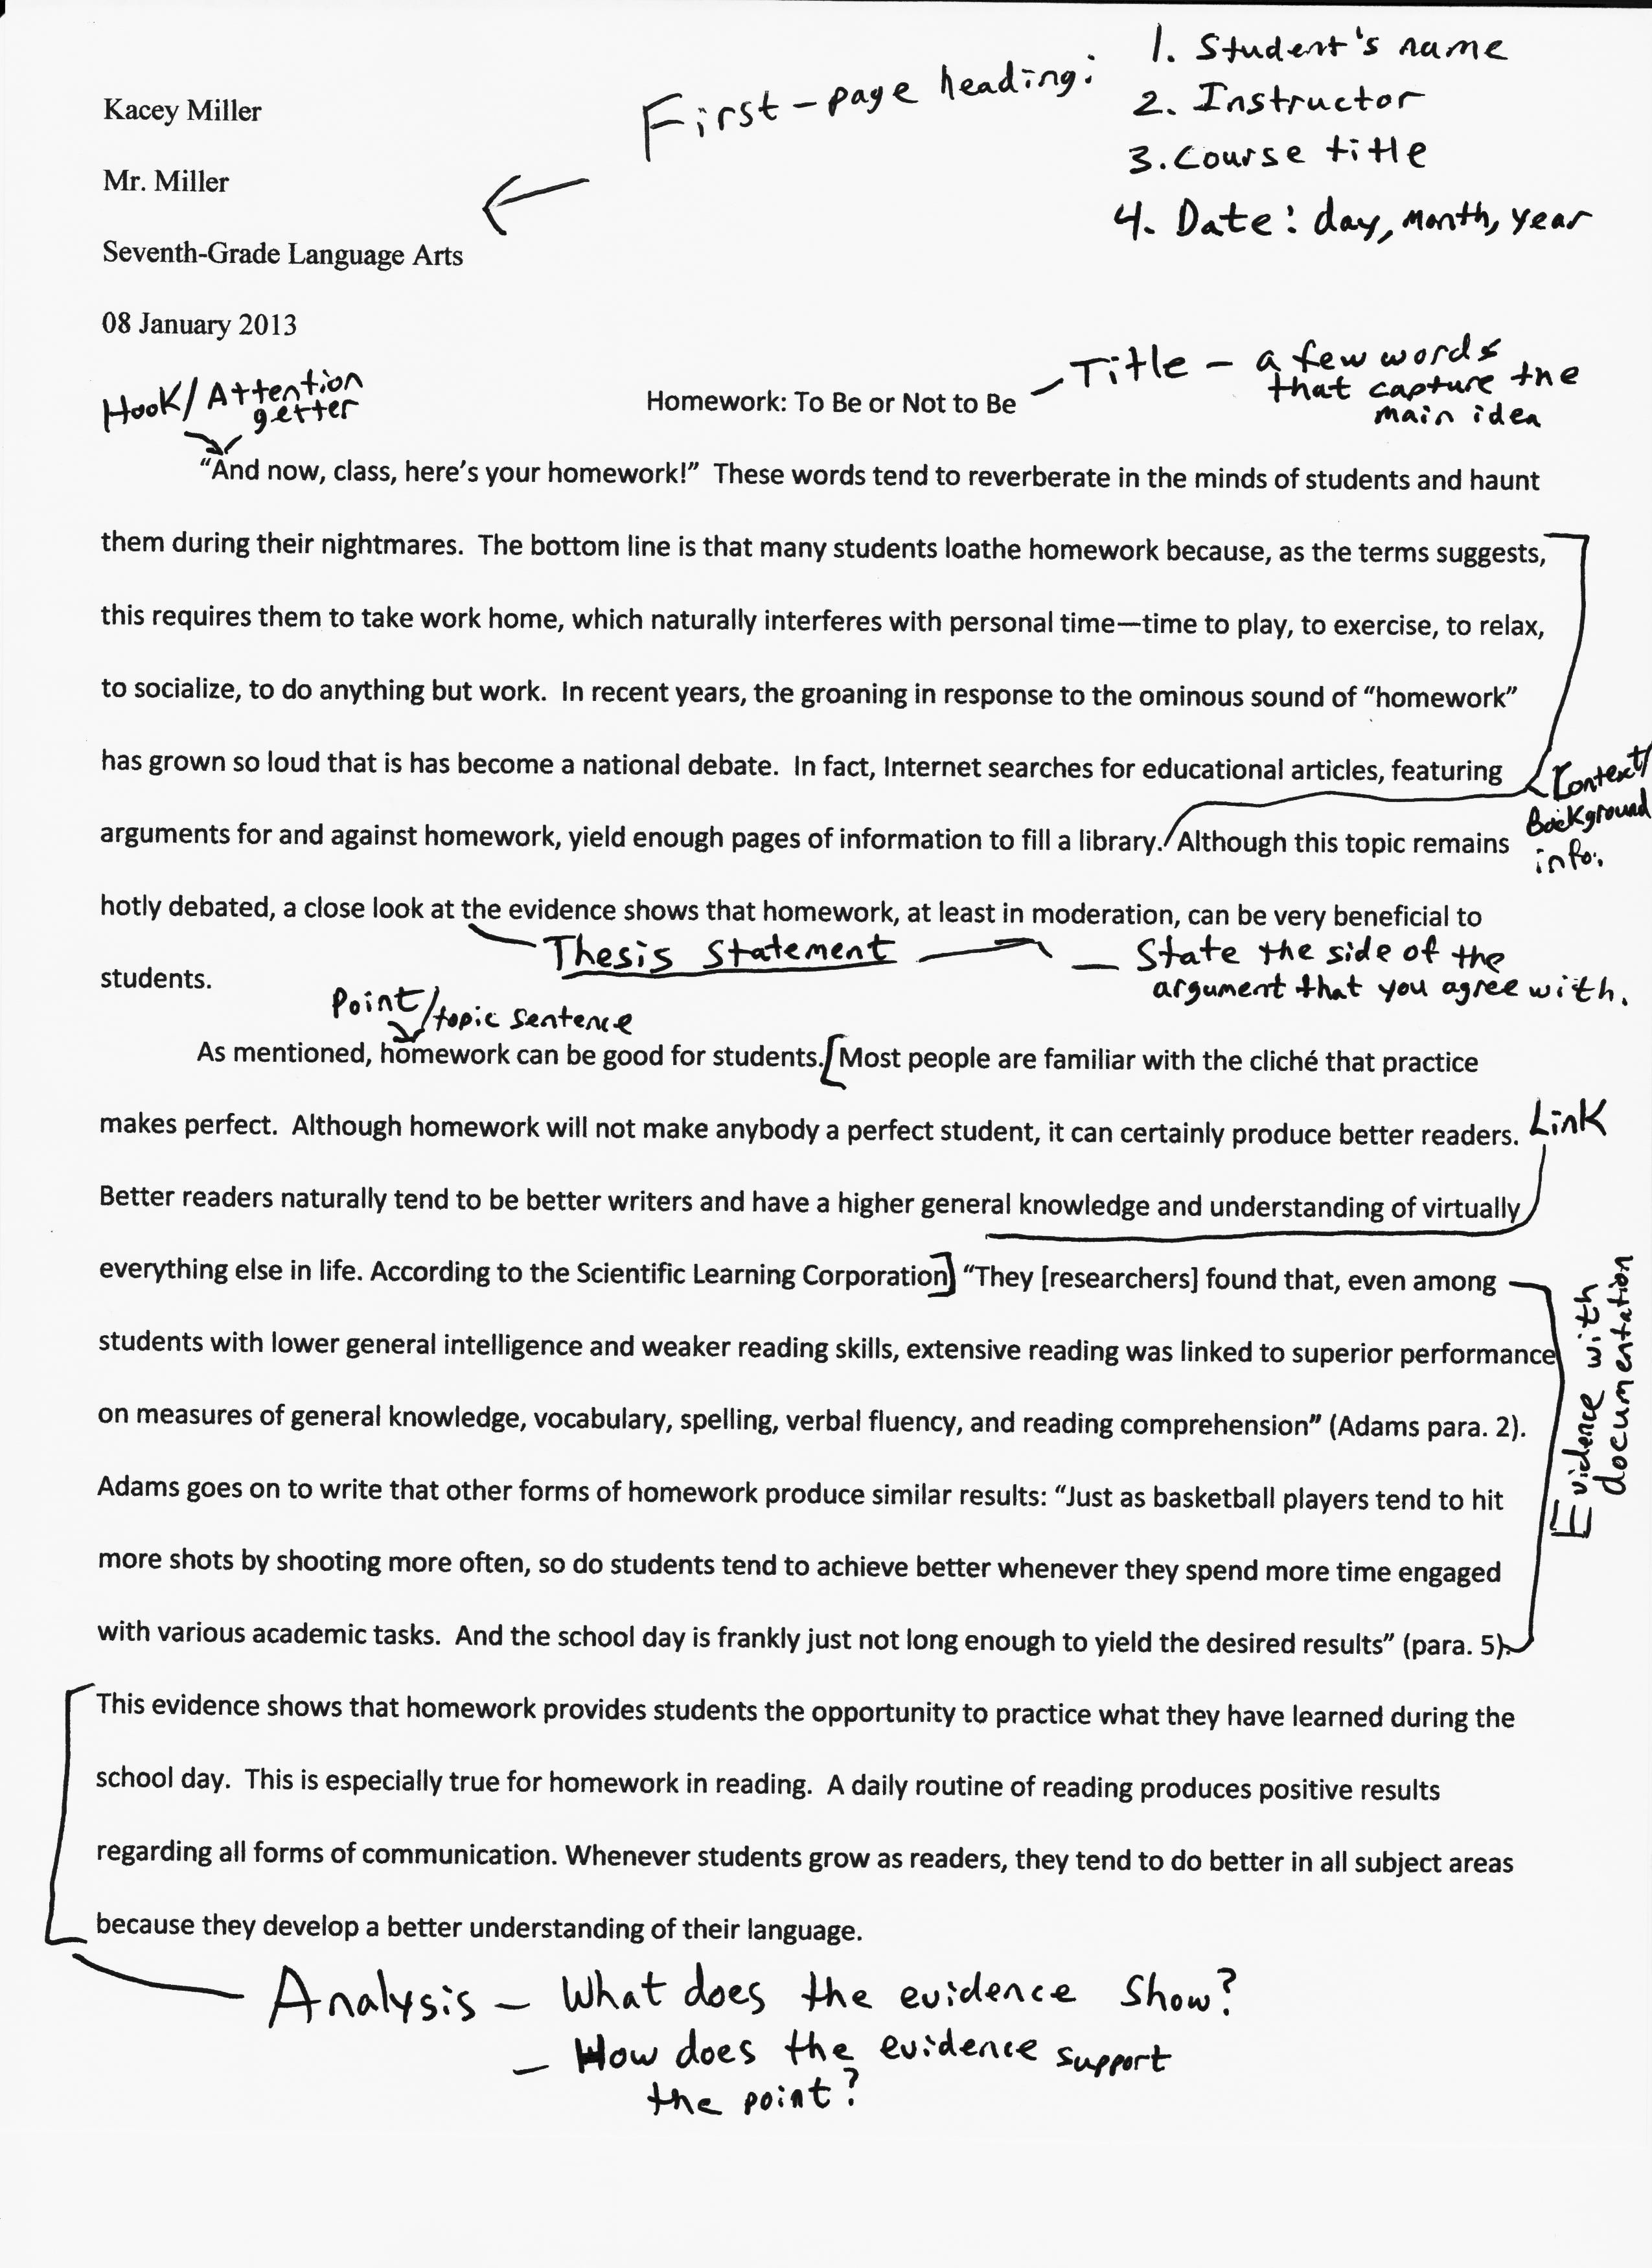 Njhs Essay Example National Junior Honor Society Application Essay Njhs Essaysexample Of Word Essay Metapods Beware Essay Examples National Honor Society Essay